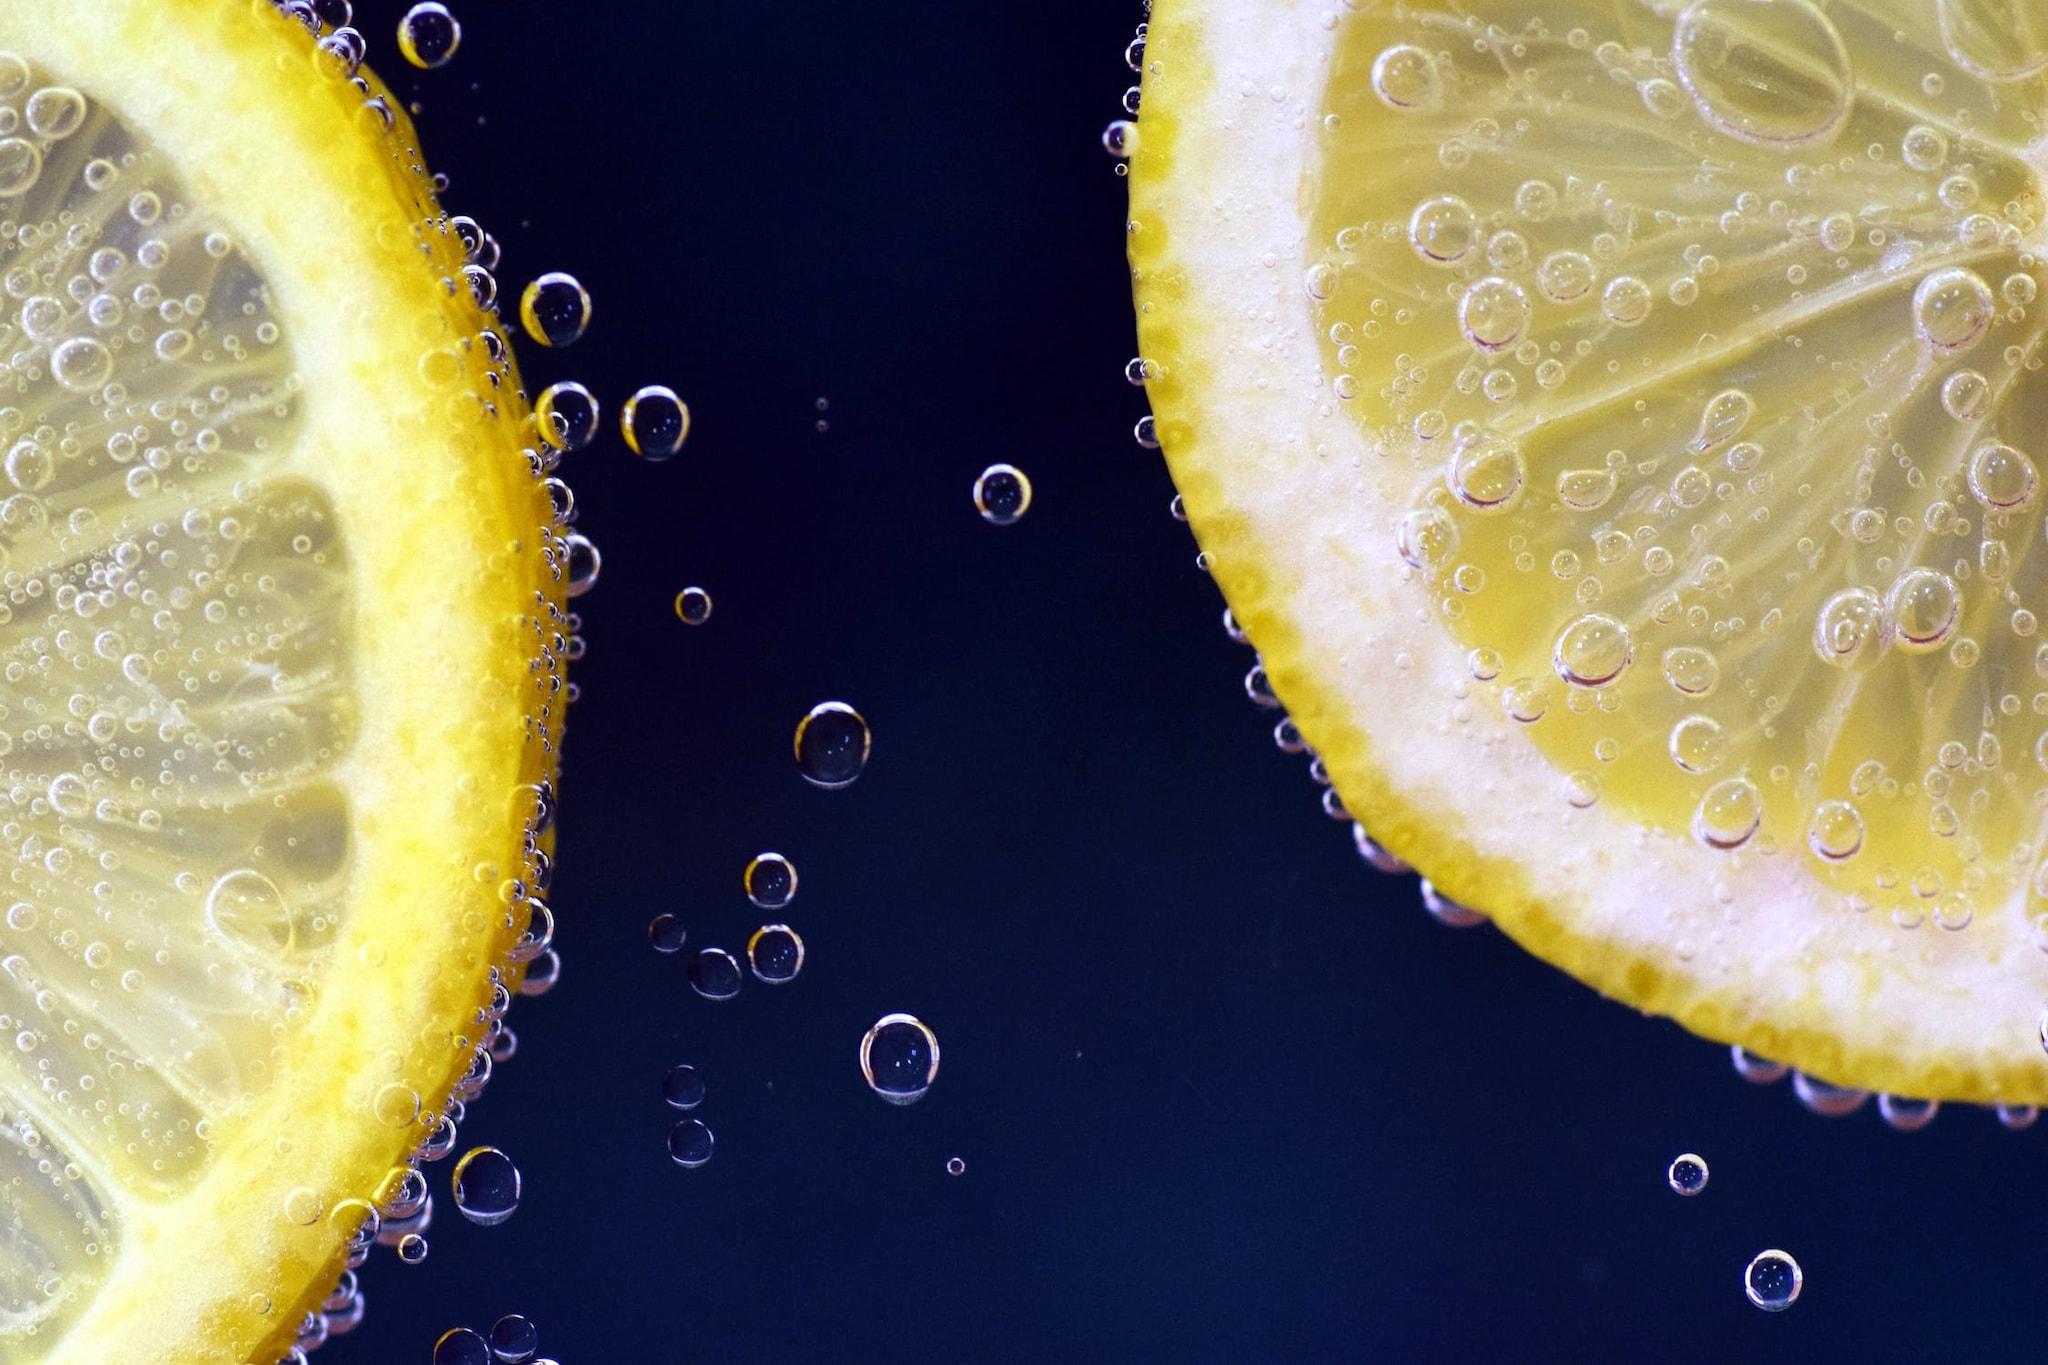 3. Citrus foods : ఉసిరి, నిమ్మకాయతో చేసే ఆహార పదార్థాల్లో గ్లైకామిక్ ఇండెక్స్ తక్కువగా ఉంటుంది. అందువల్ల డయాబెటిస్ ఉన్నవారు నిమ్మకాయ, ఆరెంజ్, కివి, ద్రాక్ష, ఉసిరి వంటి వాటిని డైట్లో చేర్చుకోవచ్చు. ఐతే... జ్యూస్లా మాత్రం తాగవద్దు. జ్యూస్లా తాగితే... గ్లూకోజ్ లెవెల్స్ ఒక్కసారిగా పెరిగిపోతాయి.